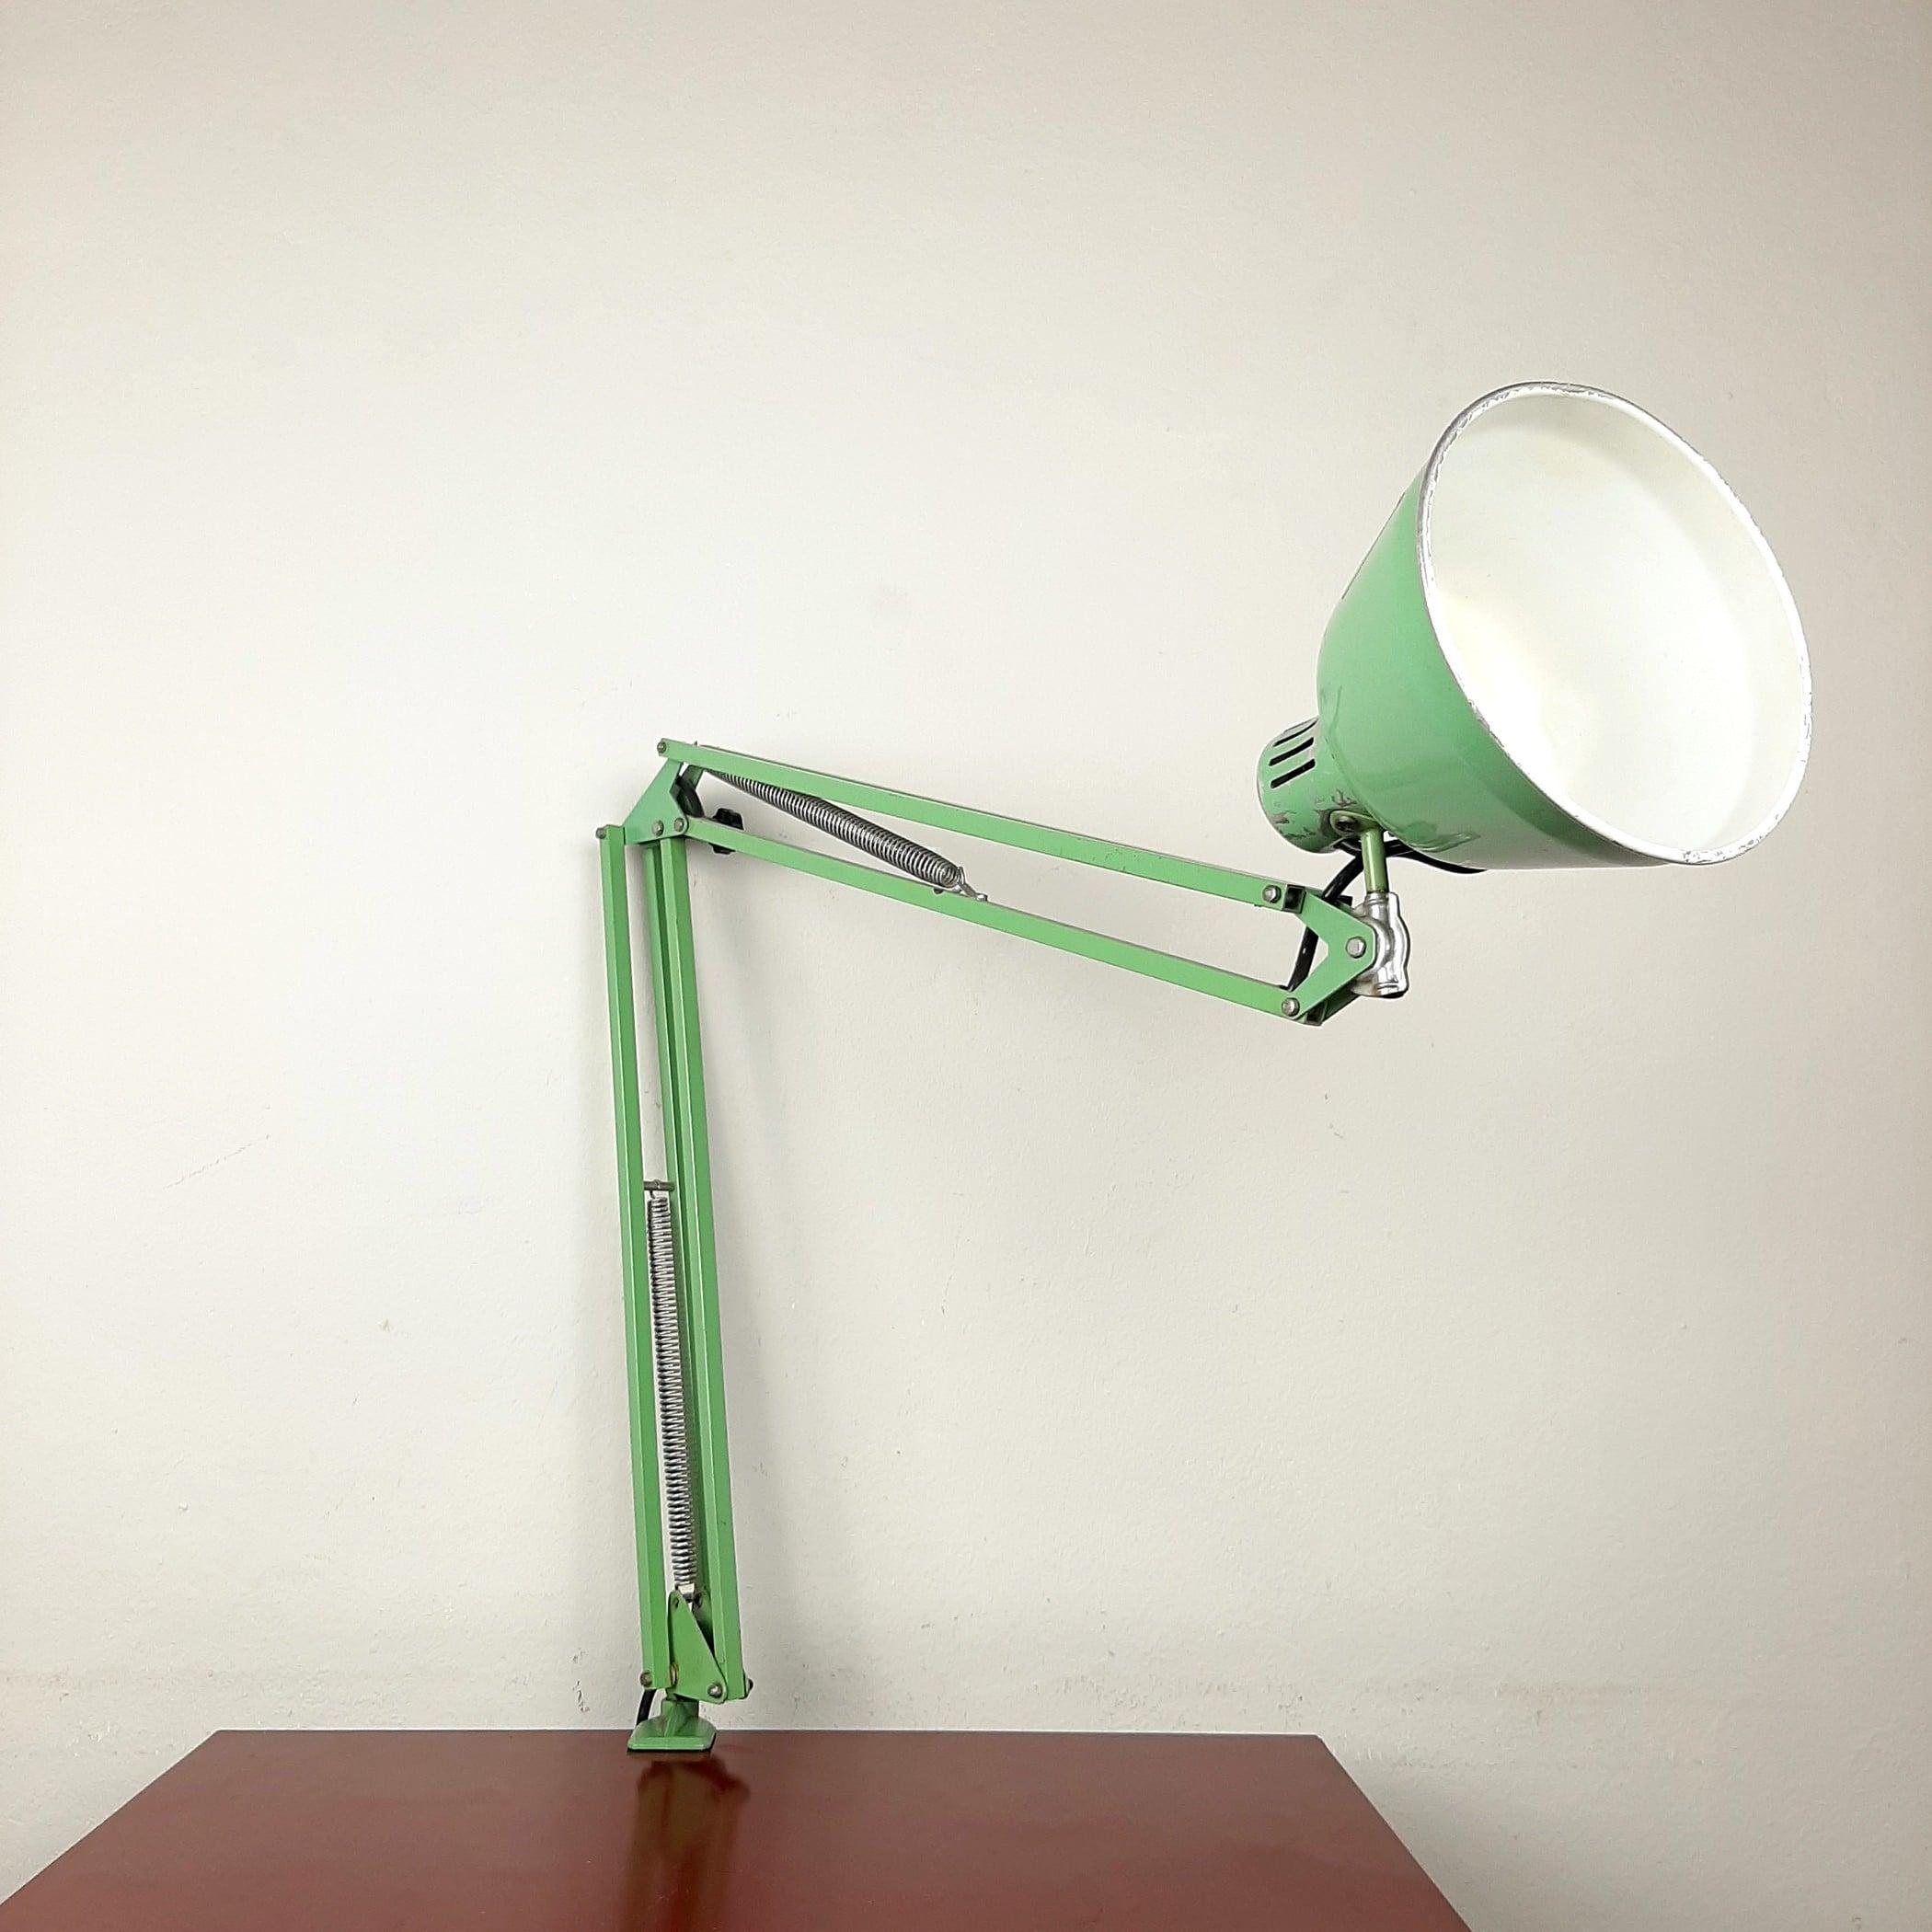 Mid-century desk lamp Brevetti Longoni Rimsa Italy '50s-60s retro office table lamp Vintage Industrial green lamp Articulating lamp